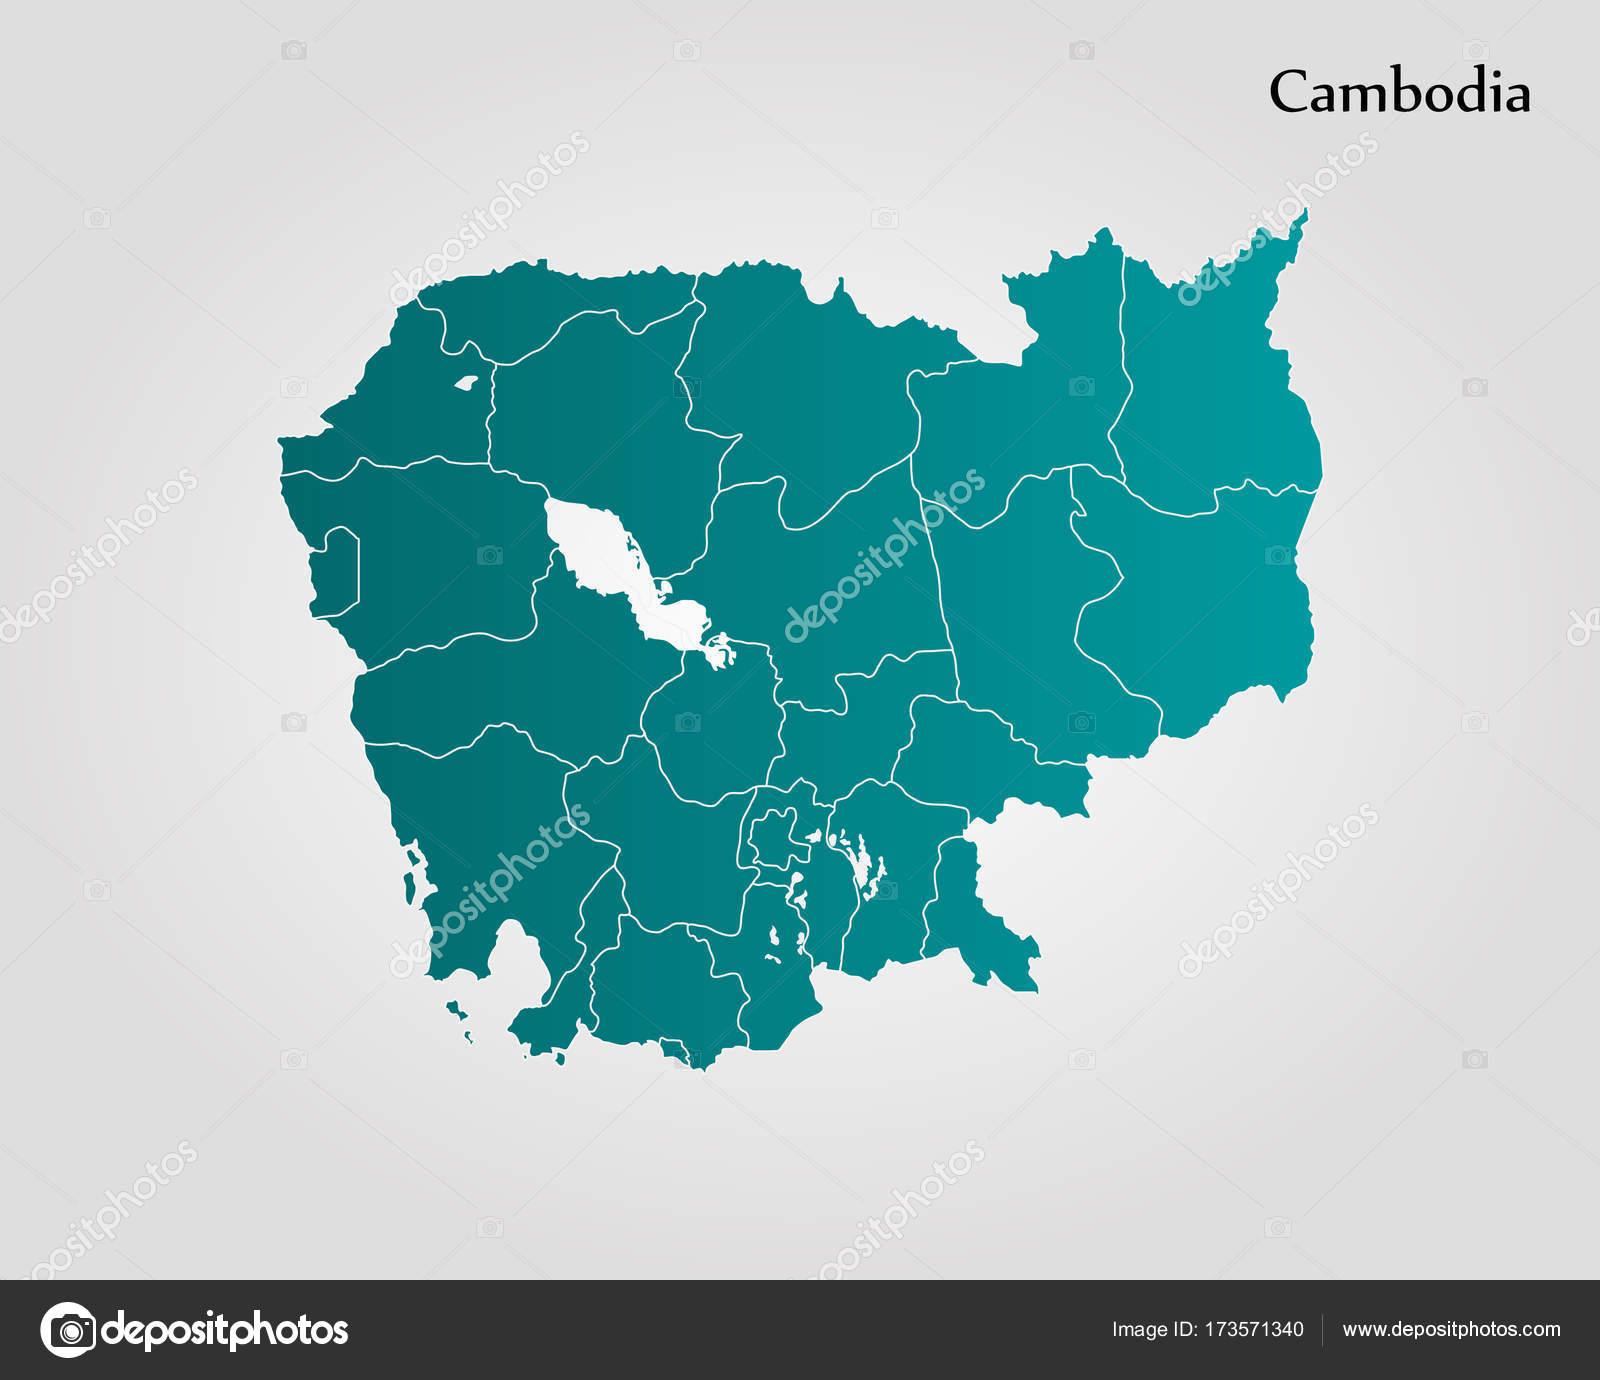 Map of cambodia stock vector uglegorets 173571340 map of cambodia vector illustration world map vector by uglegorets gumiabroncs Images